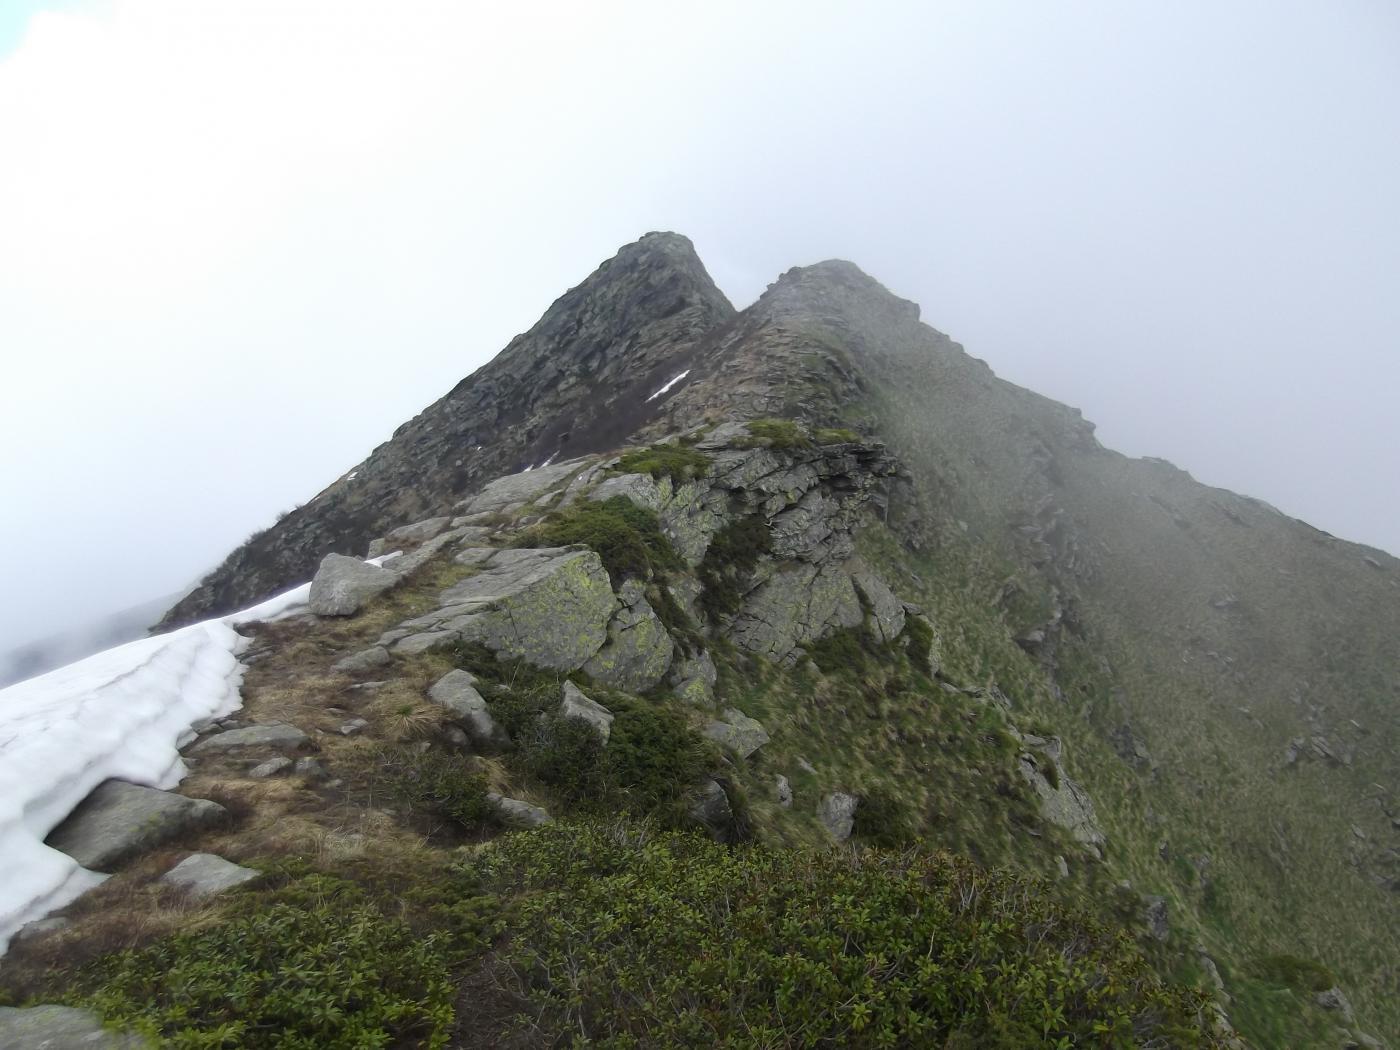 verso il Monte Vantacul